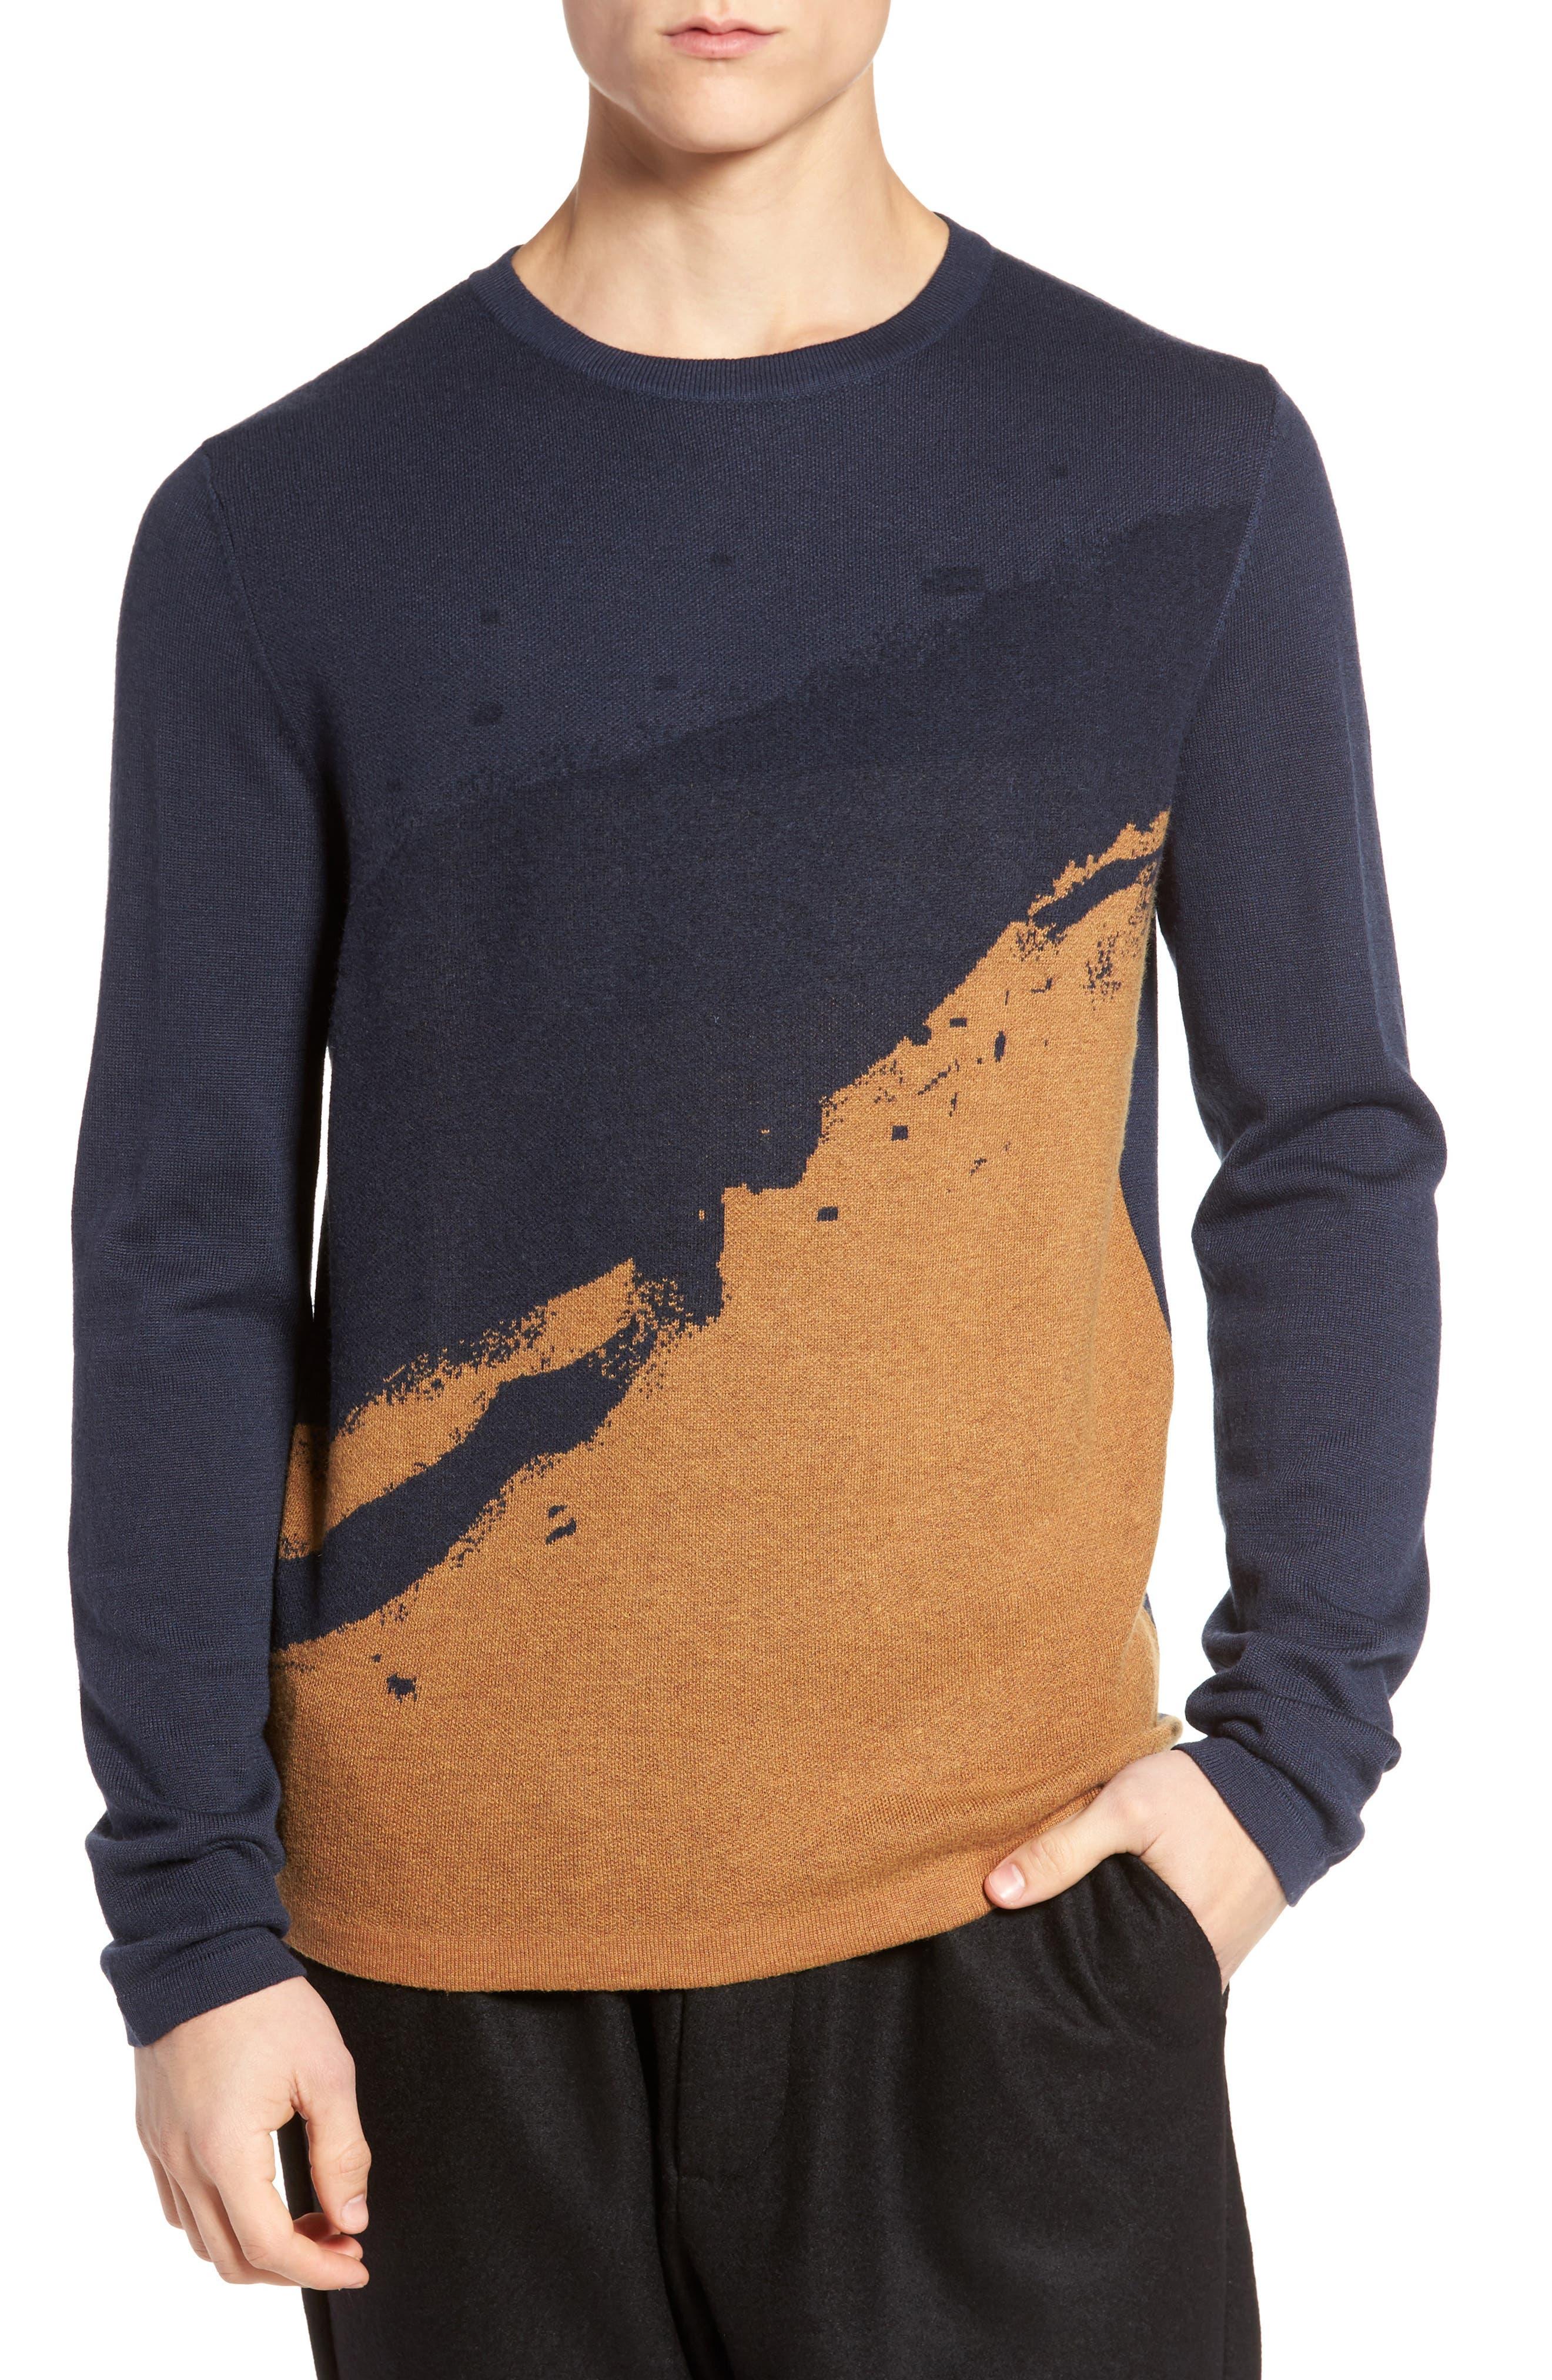 Anotny Morato Pattern Sweater,                             Main thumbnail 1, color,                             Soft Blue